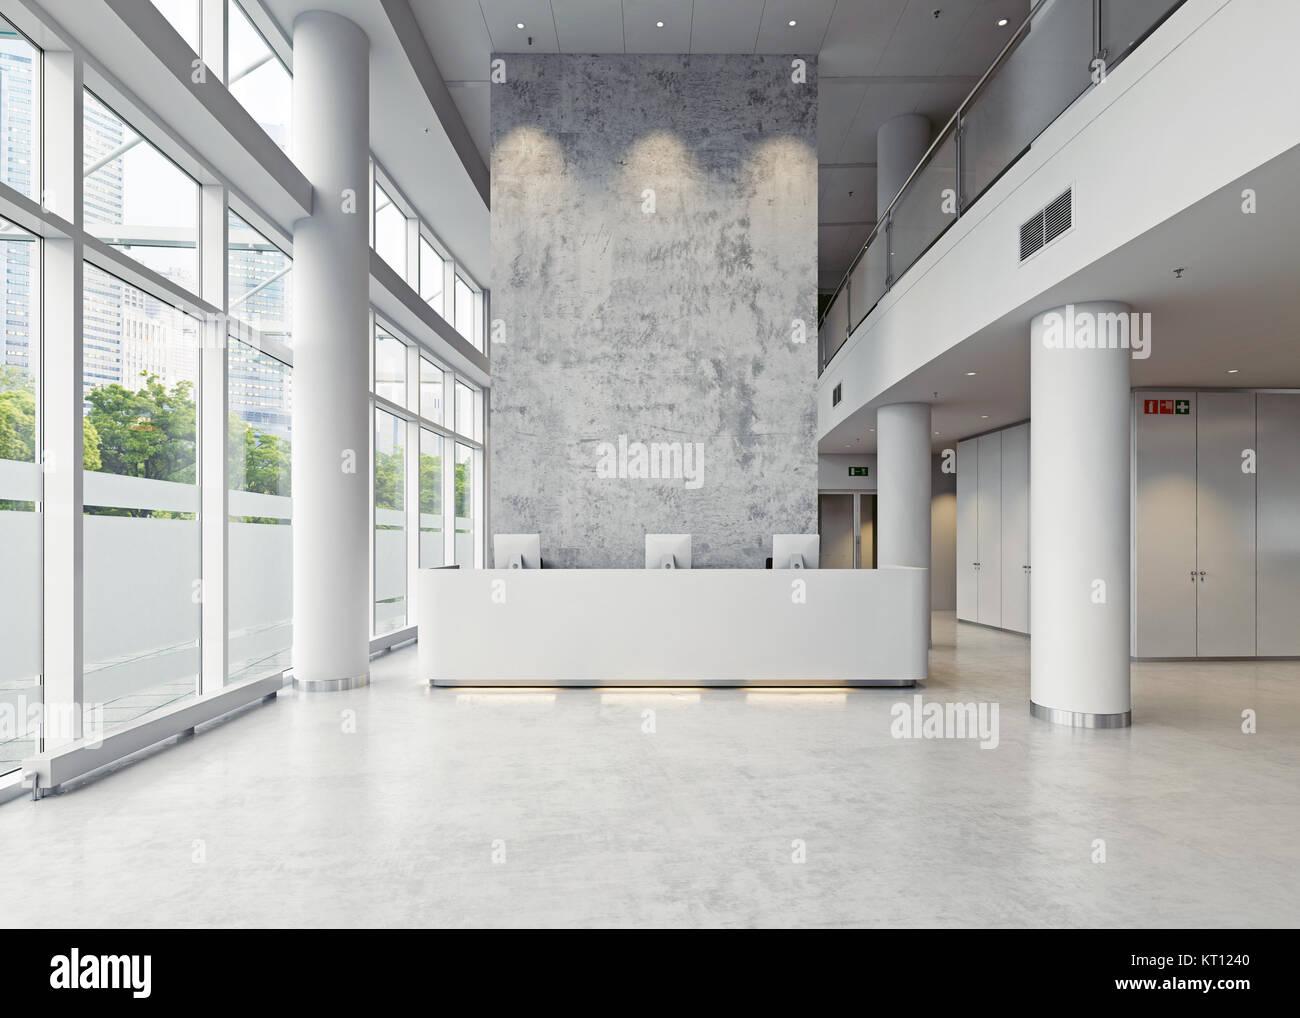 La moderna sala de negocios arquitectura. Concepto 3d Imagen De Stock